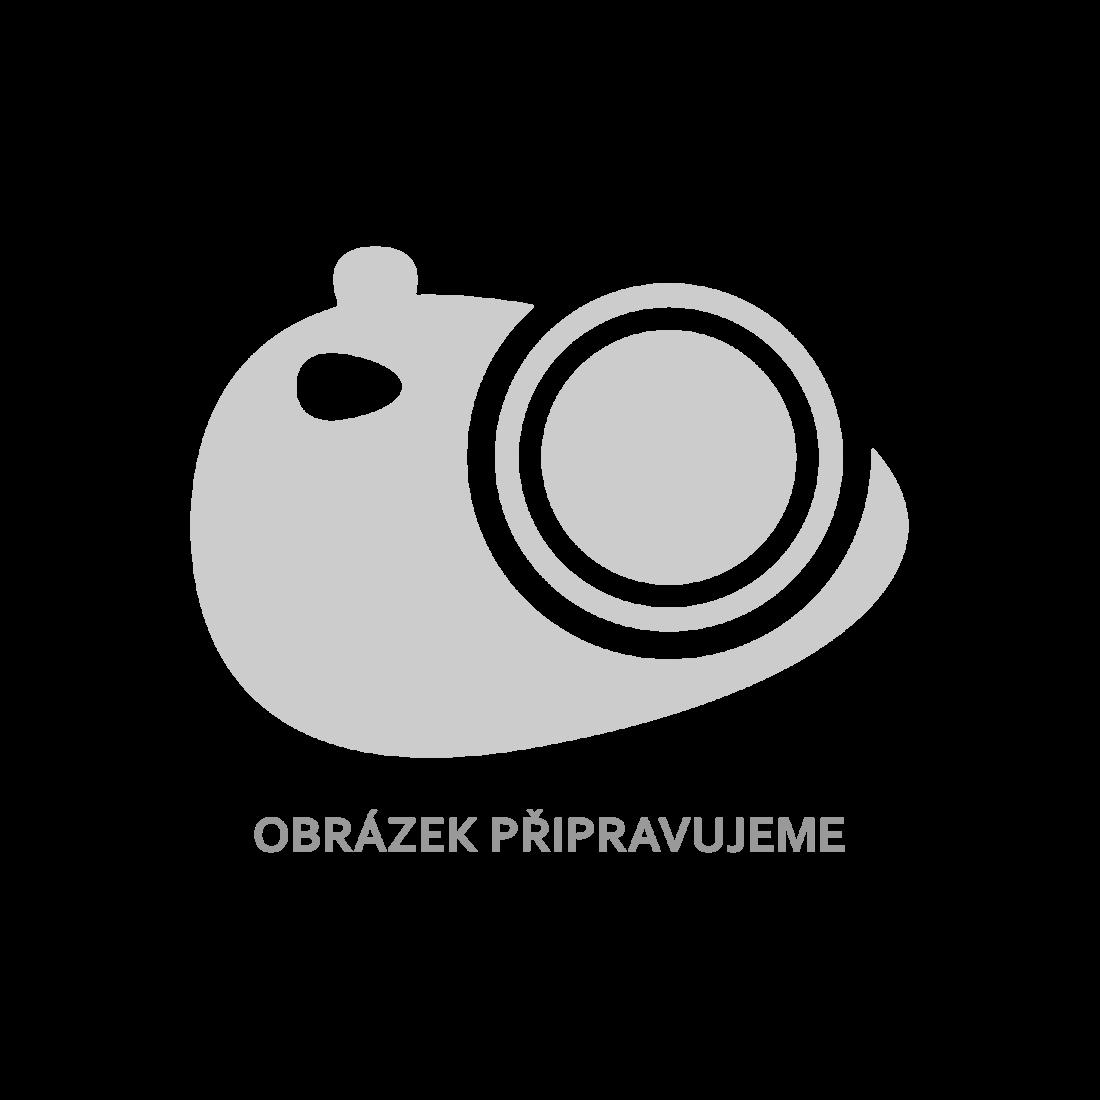 vidaXL Knihovna černá s vysokým leskem 98 x 30 x 98 cm dřevotříska [801132]